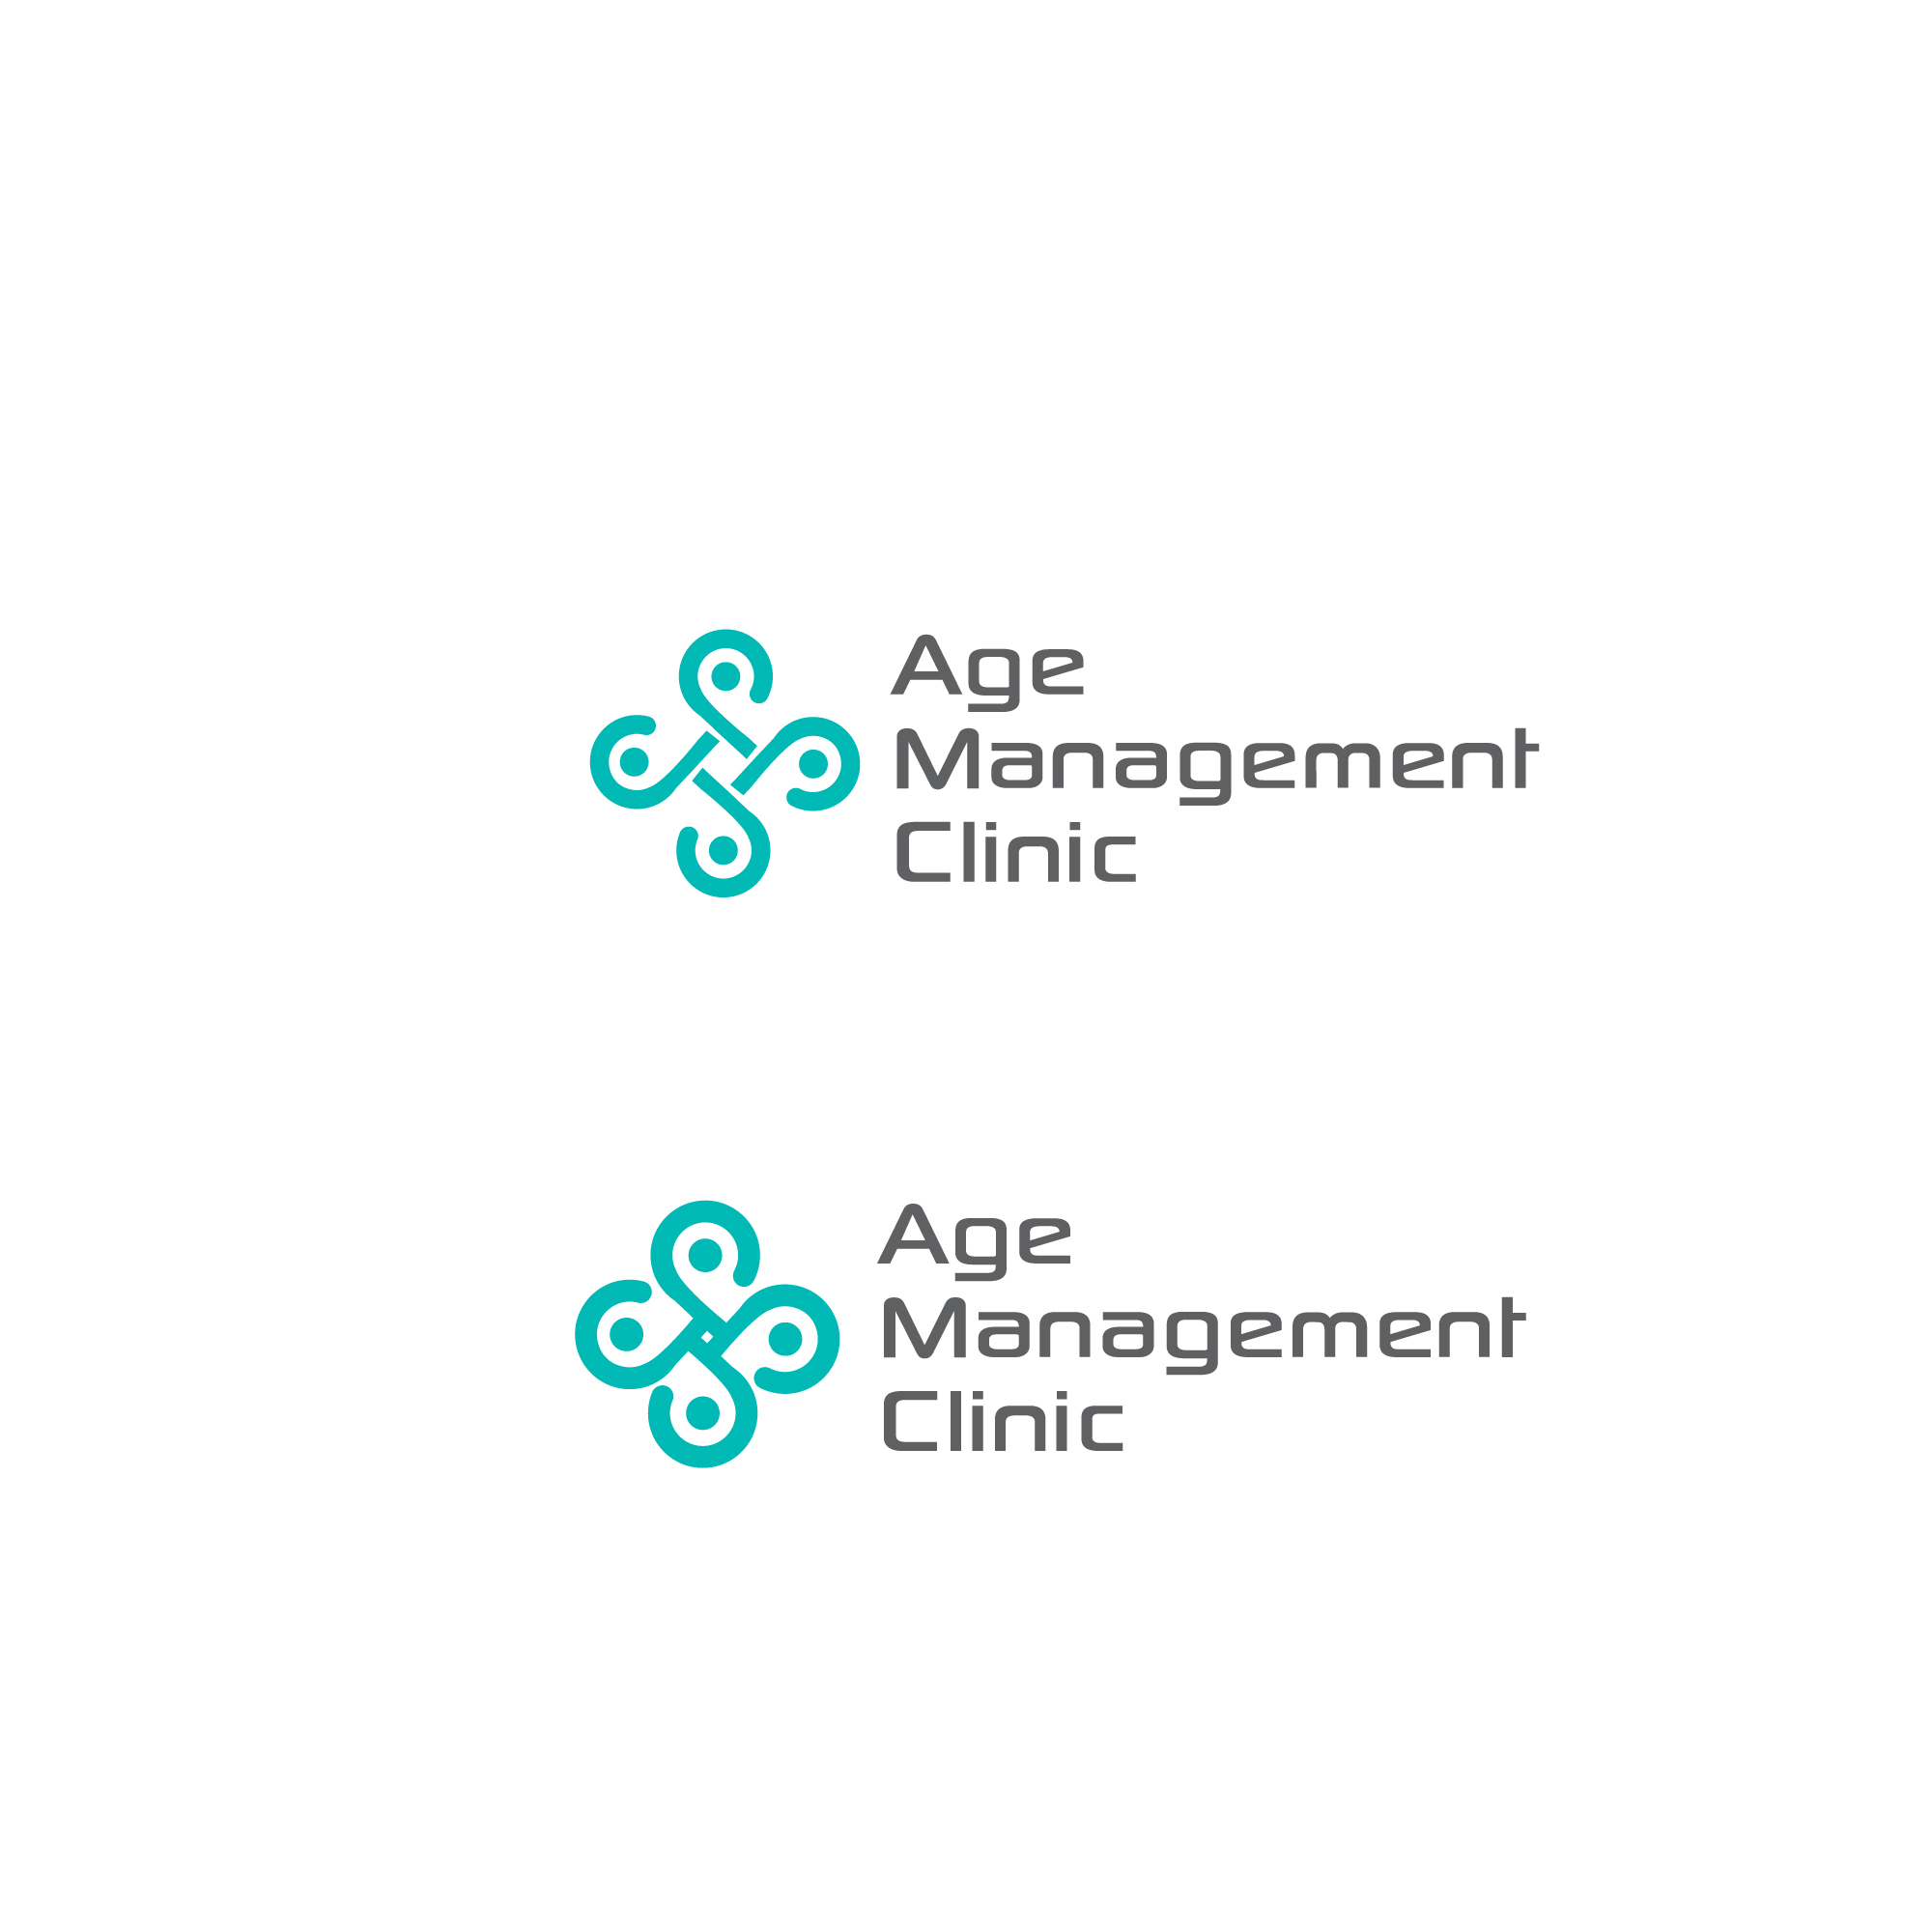 Логотип для медицинского центра (клиники)  фото f_9135b98e6e64ac42.jpg